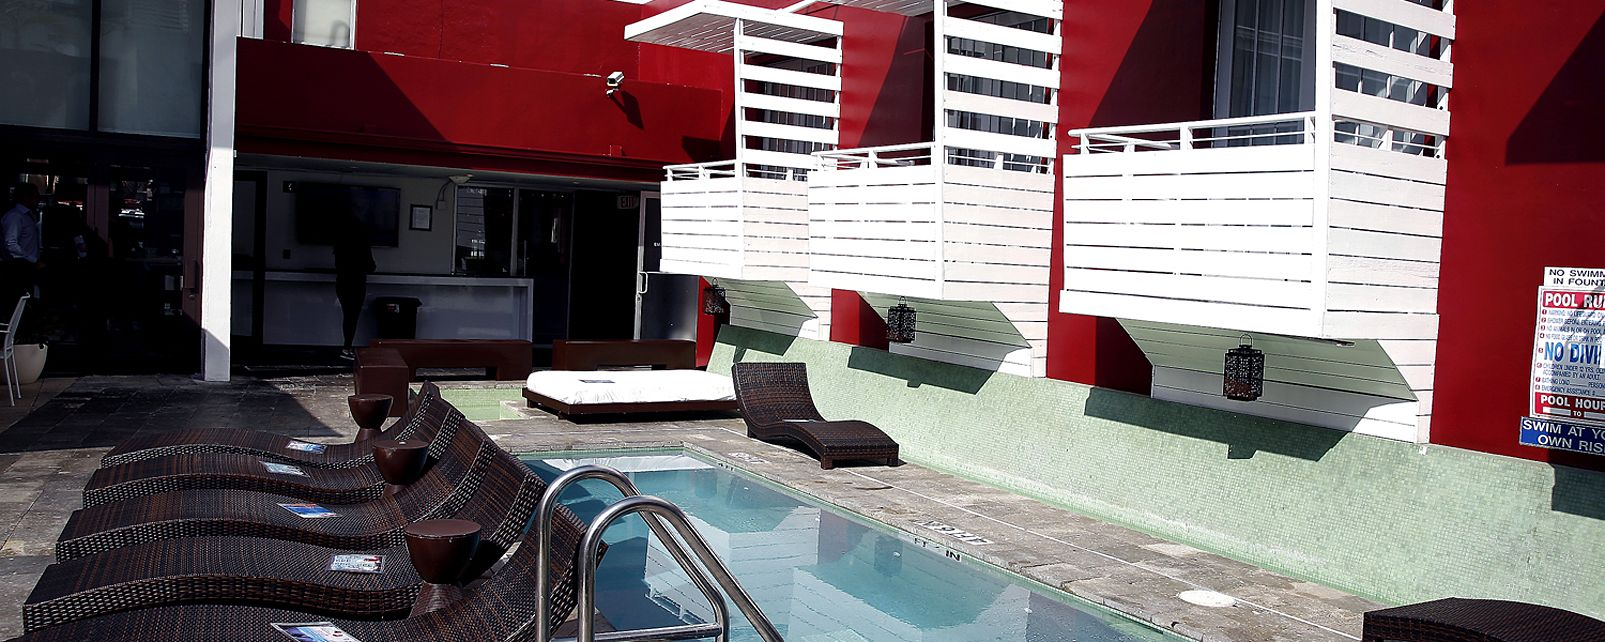 Hotel Clinton